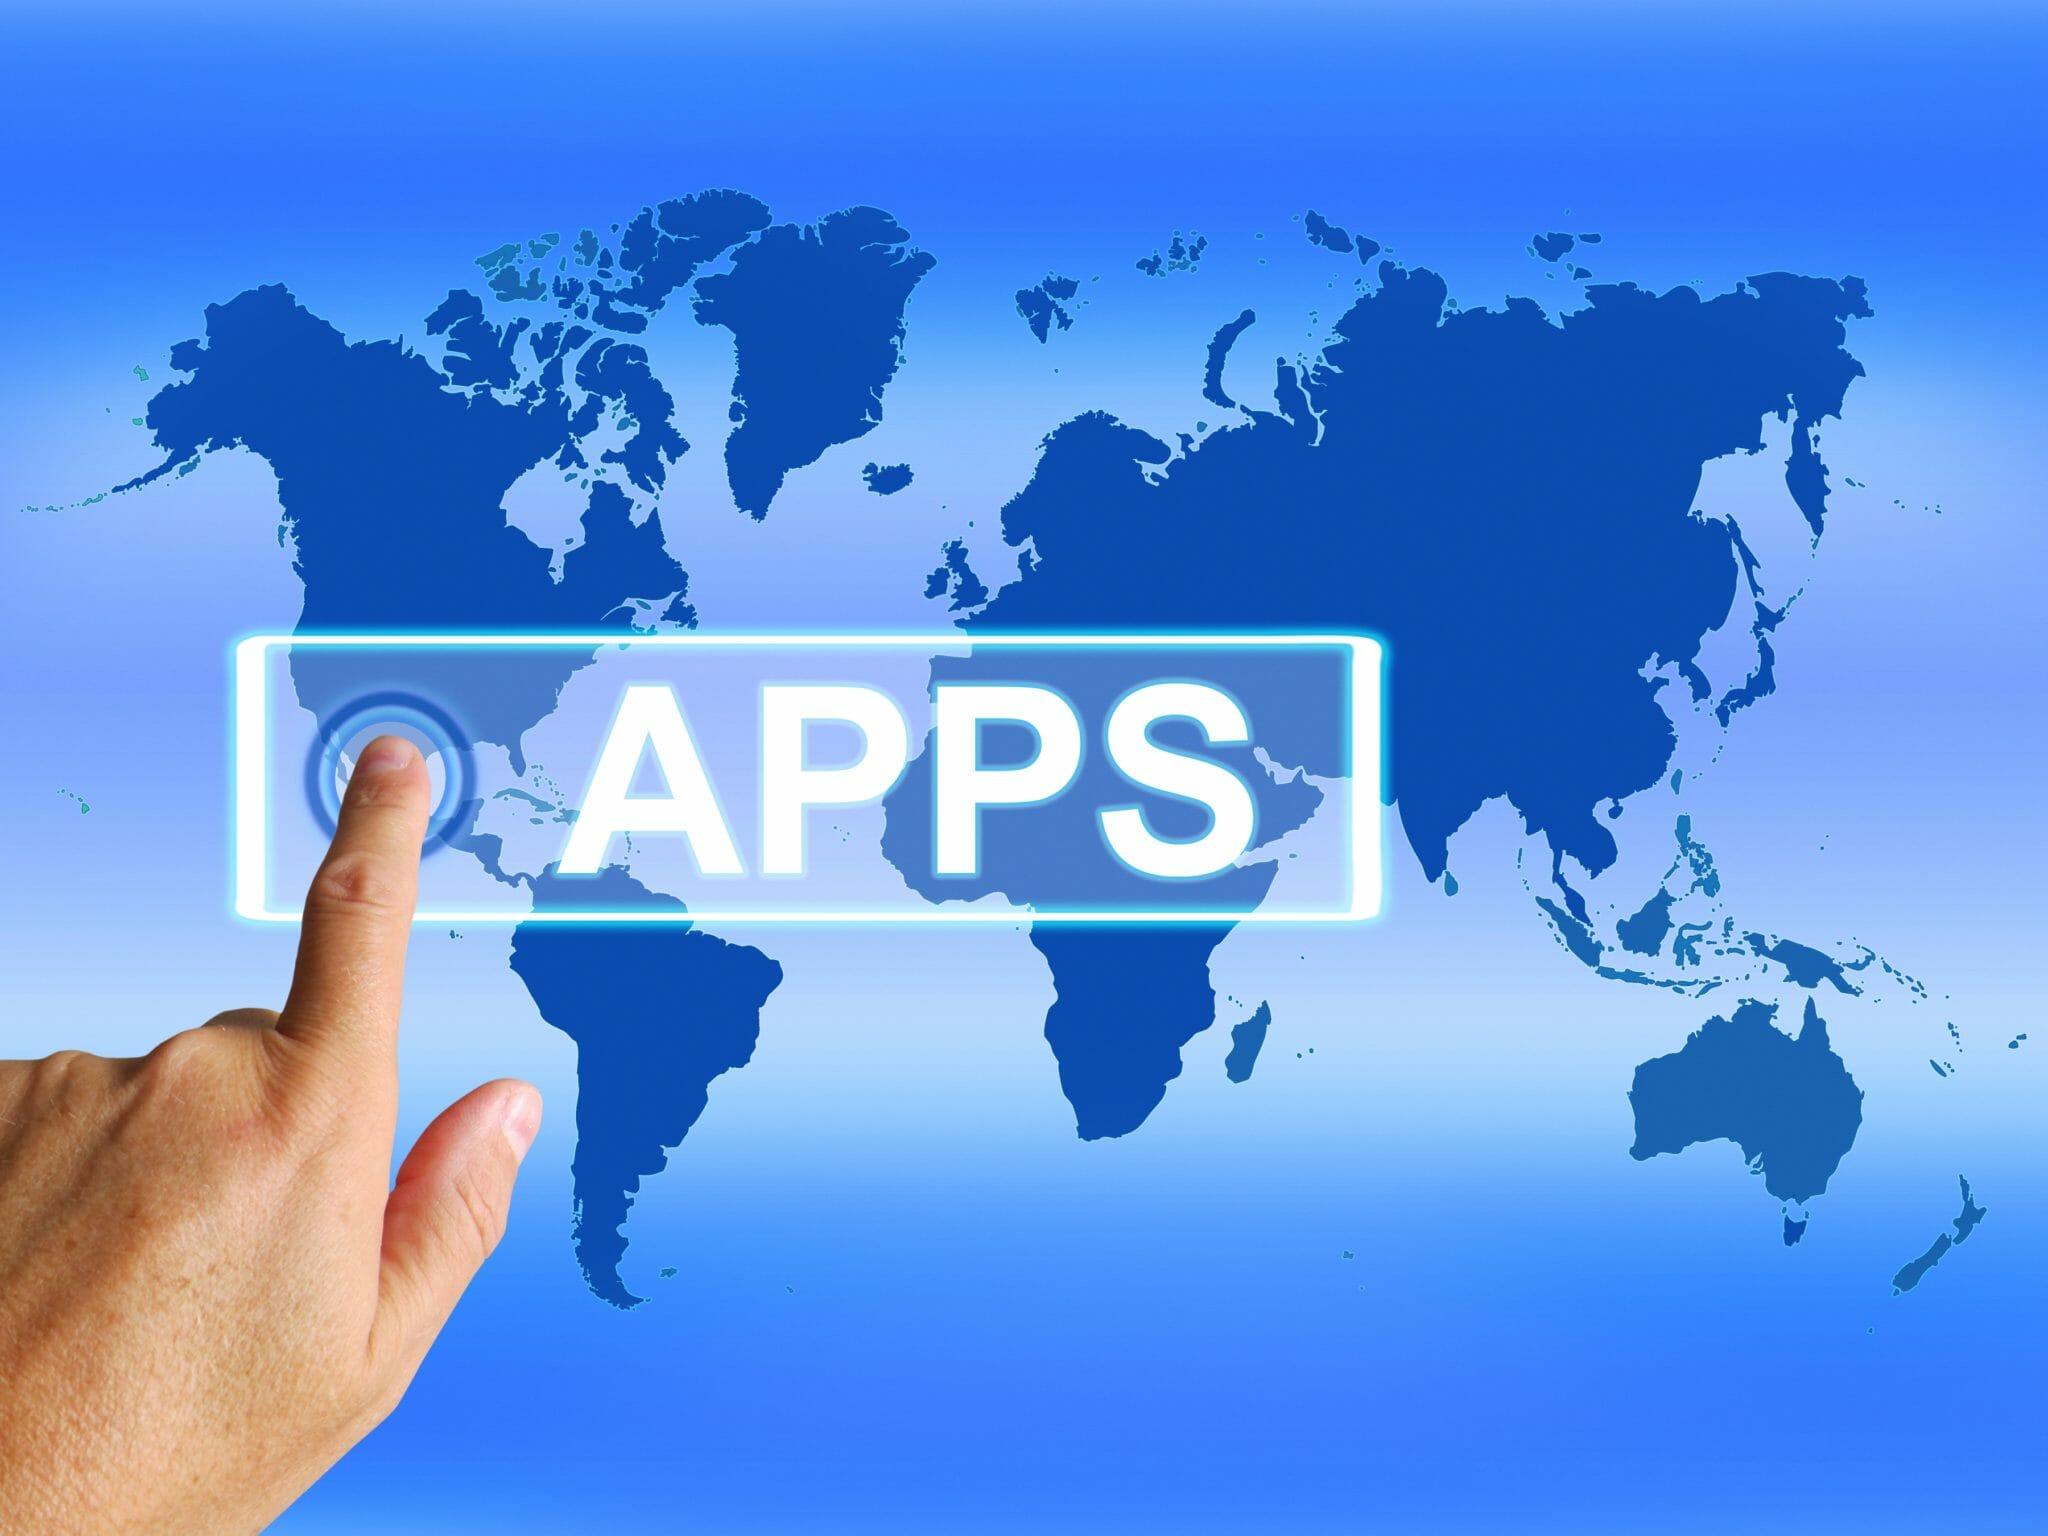 mobile Project management apps - PMWorld 360